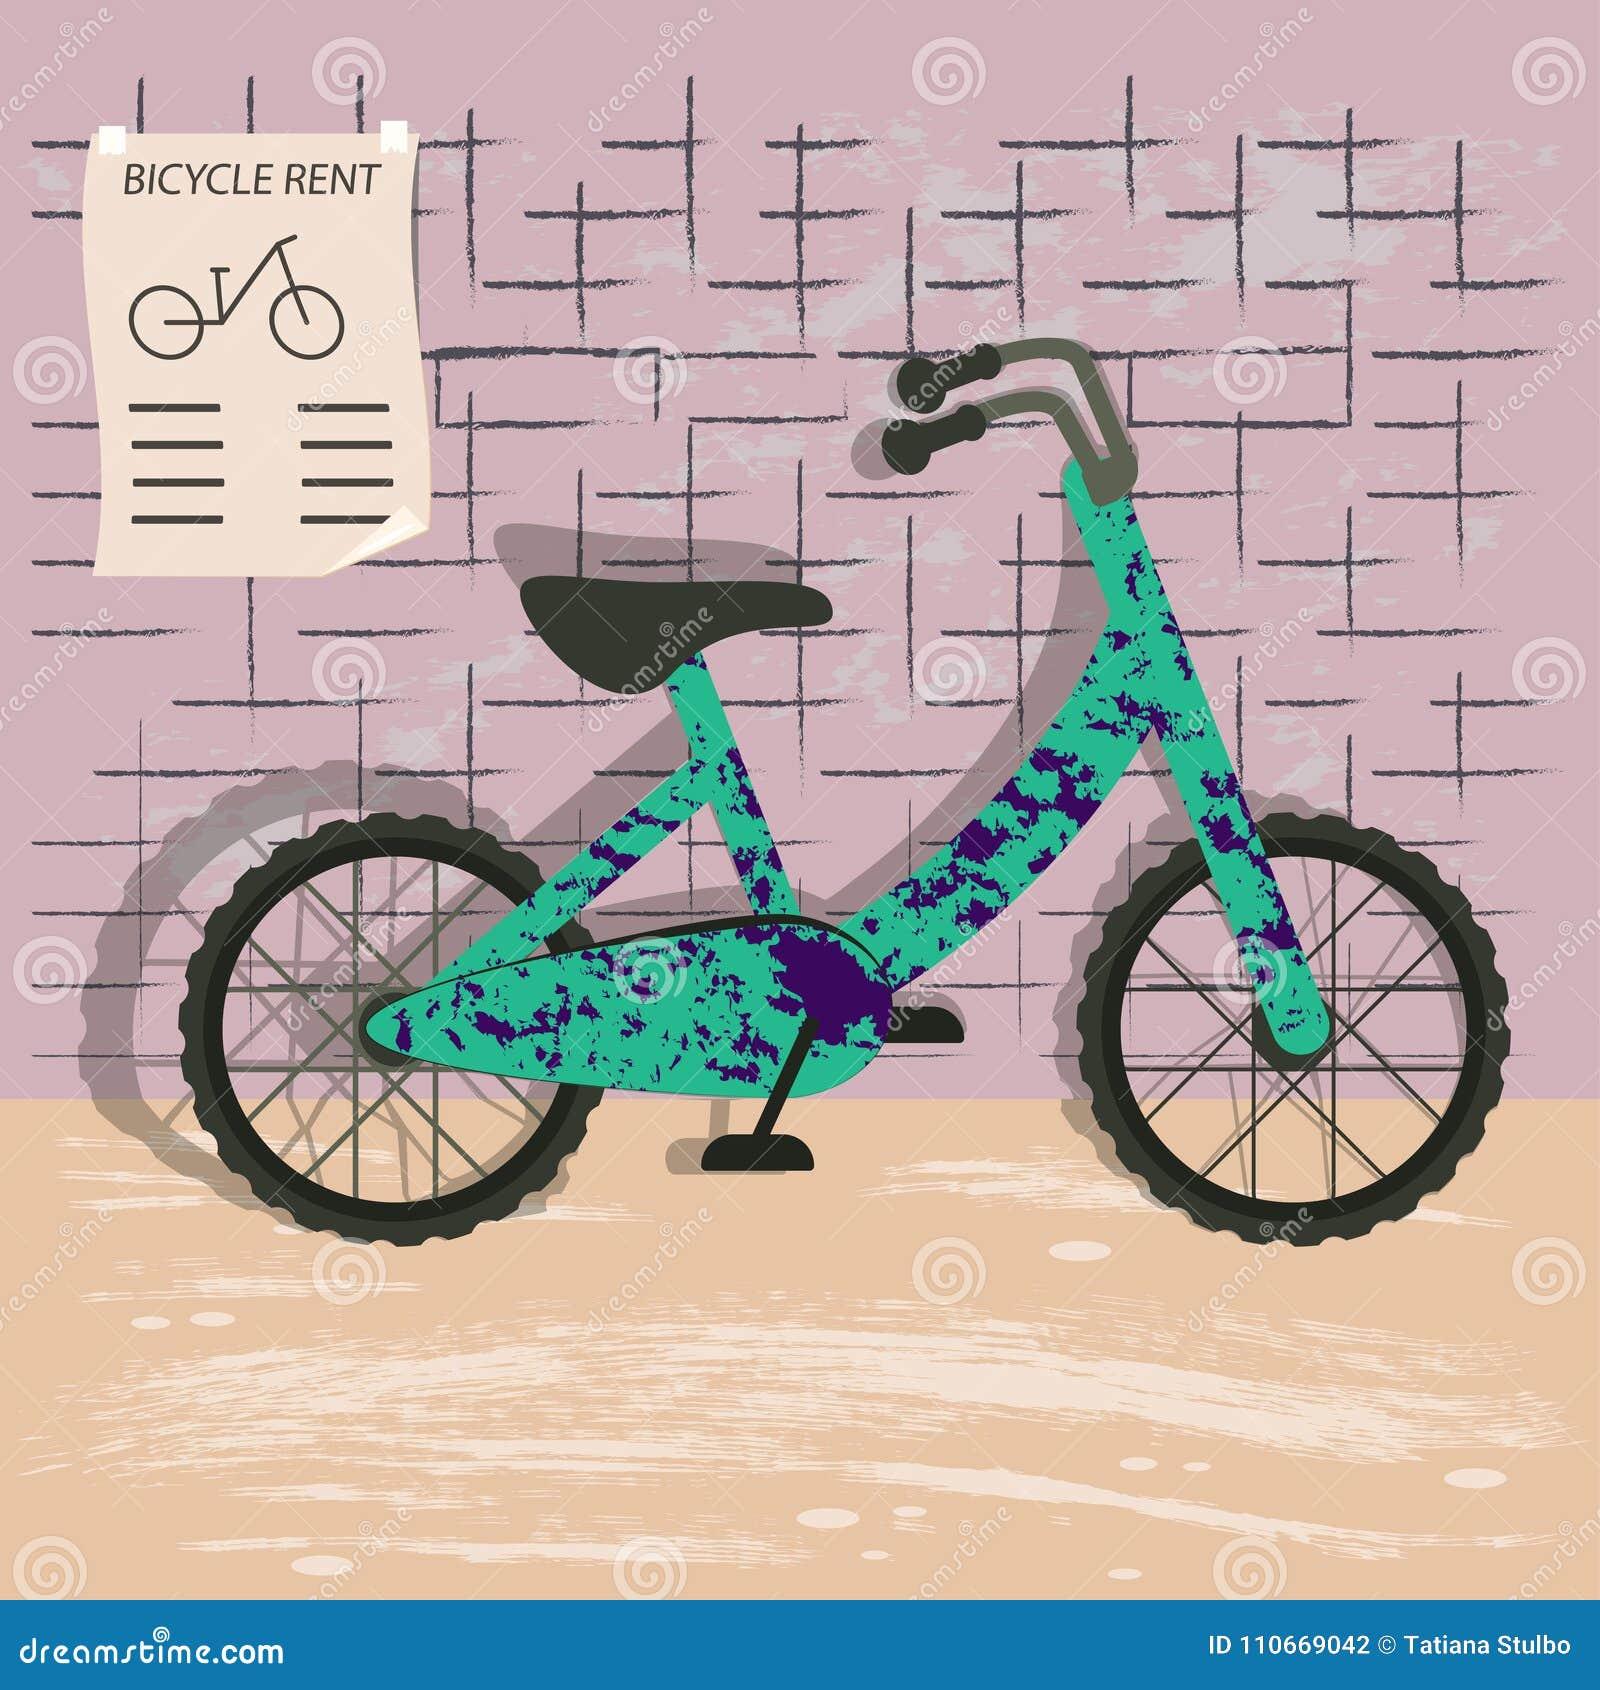 Bicycle rent illustration